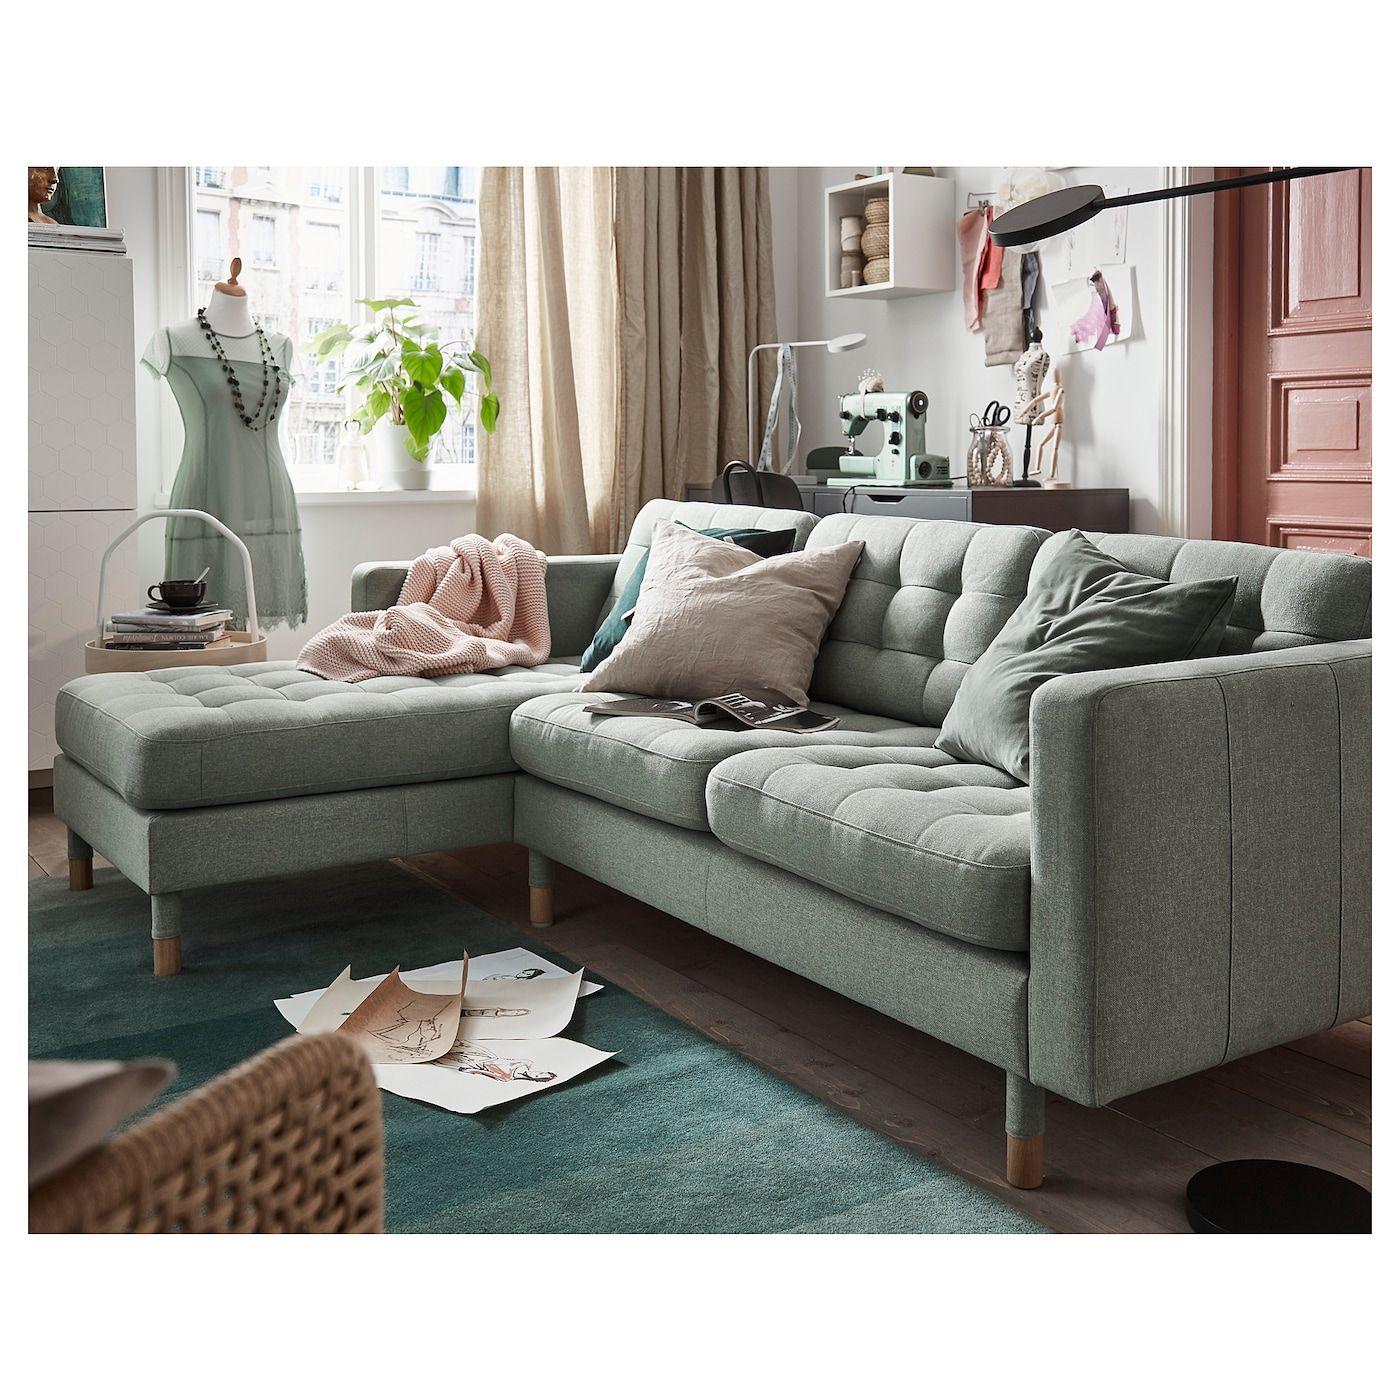 Home Furniture Store Modern Furnishings Décor Grüne